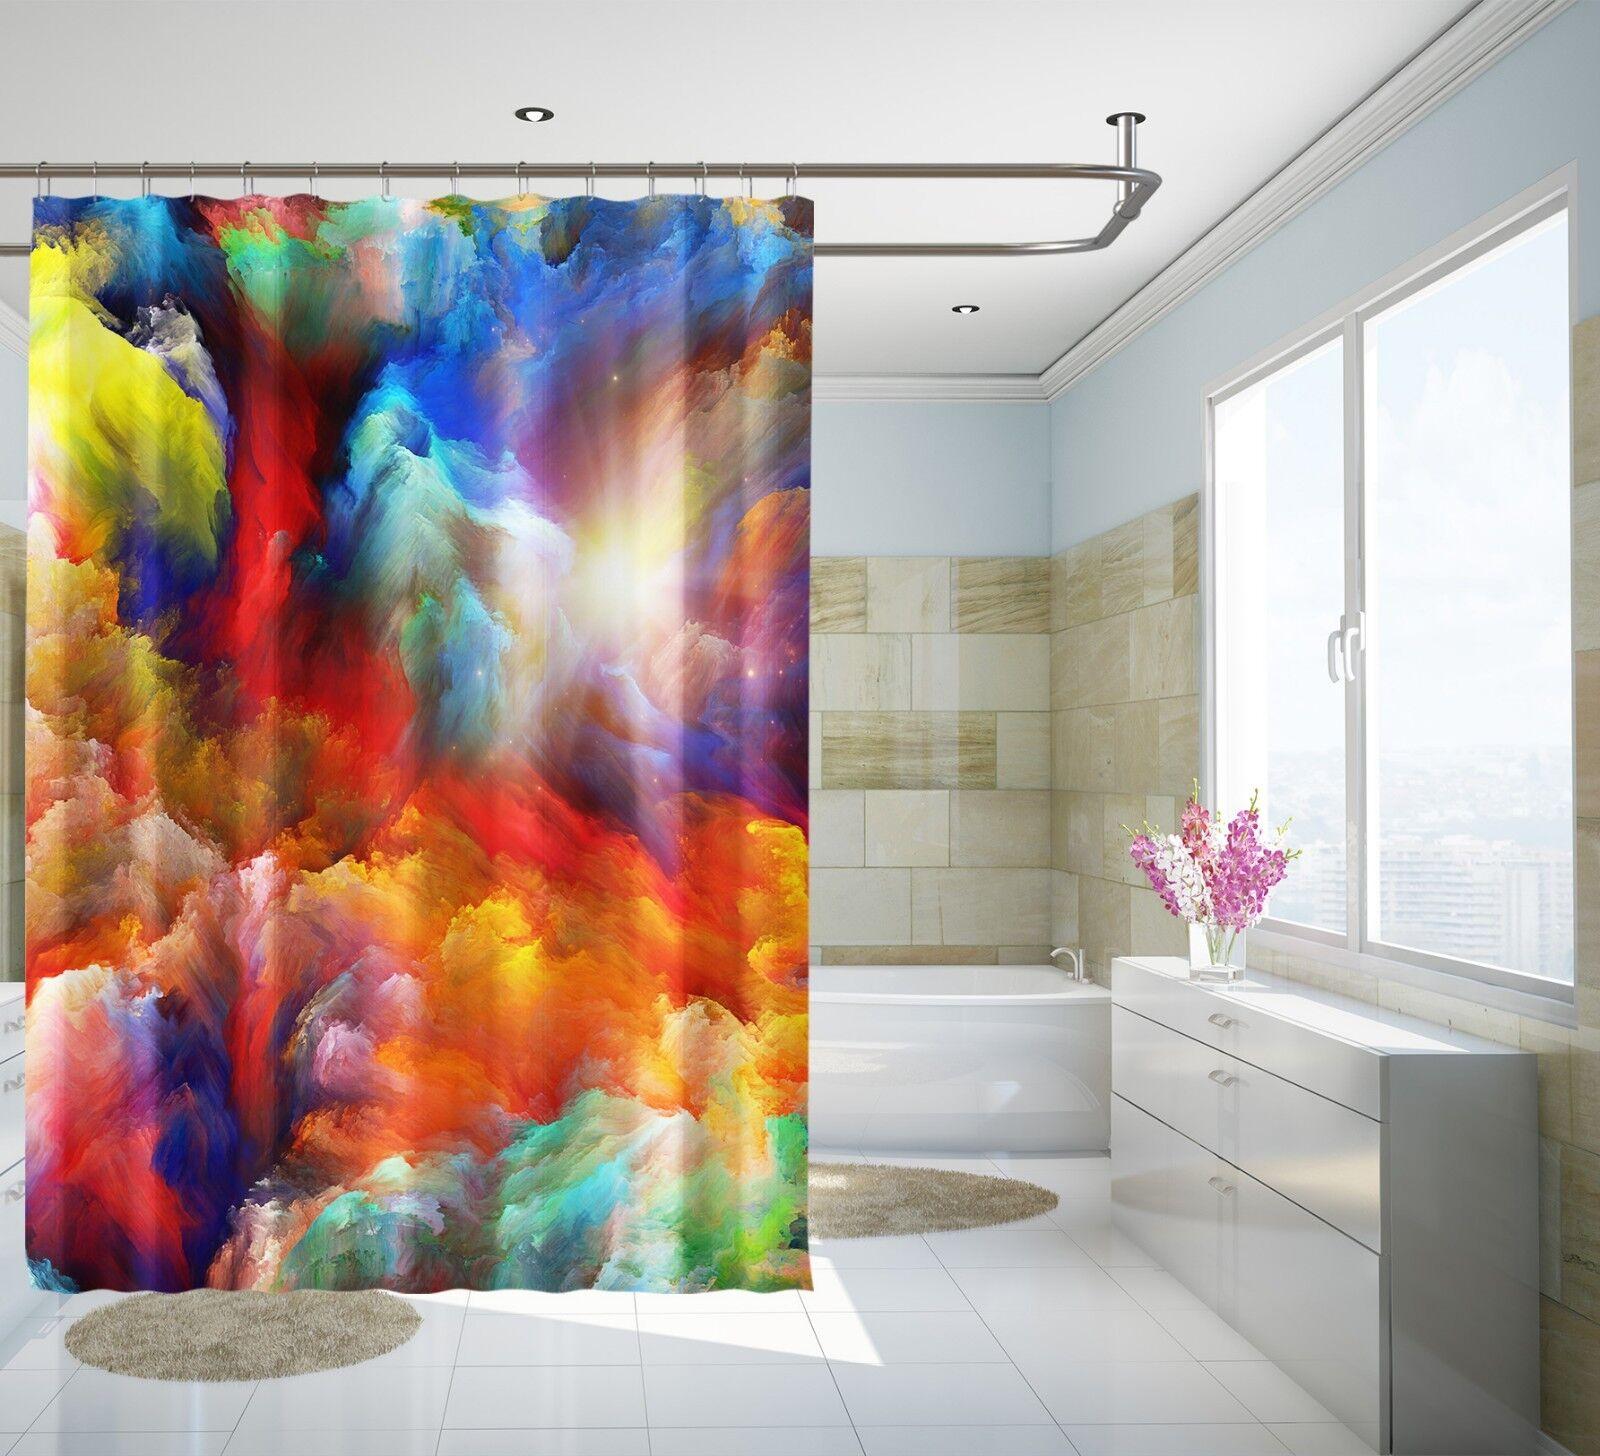 3D Farbe Graffit 65 Shower Shower Shower Curtain Waterproof Fiber Bathroom Home Windows Toilet b3e606